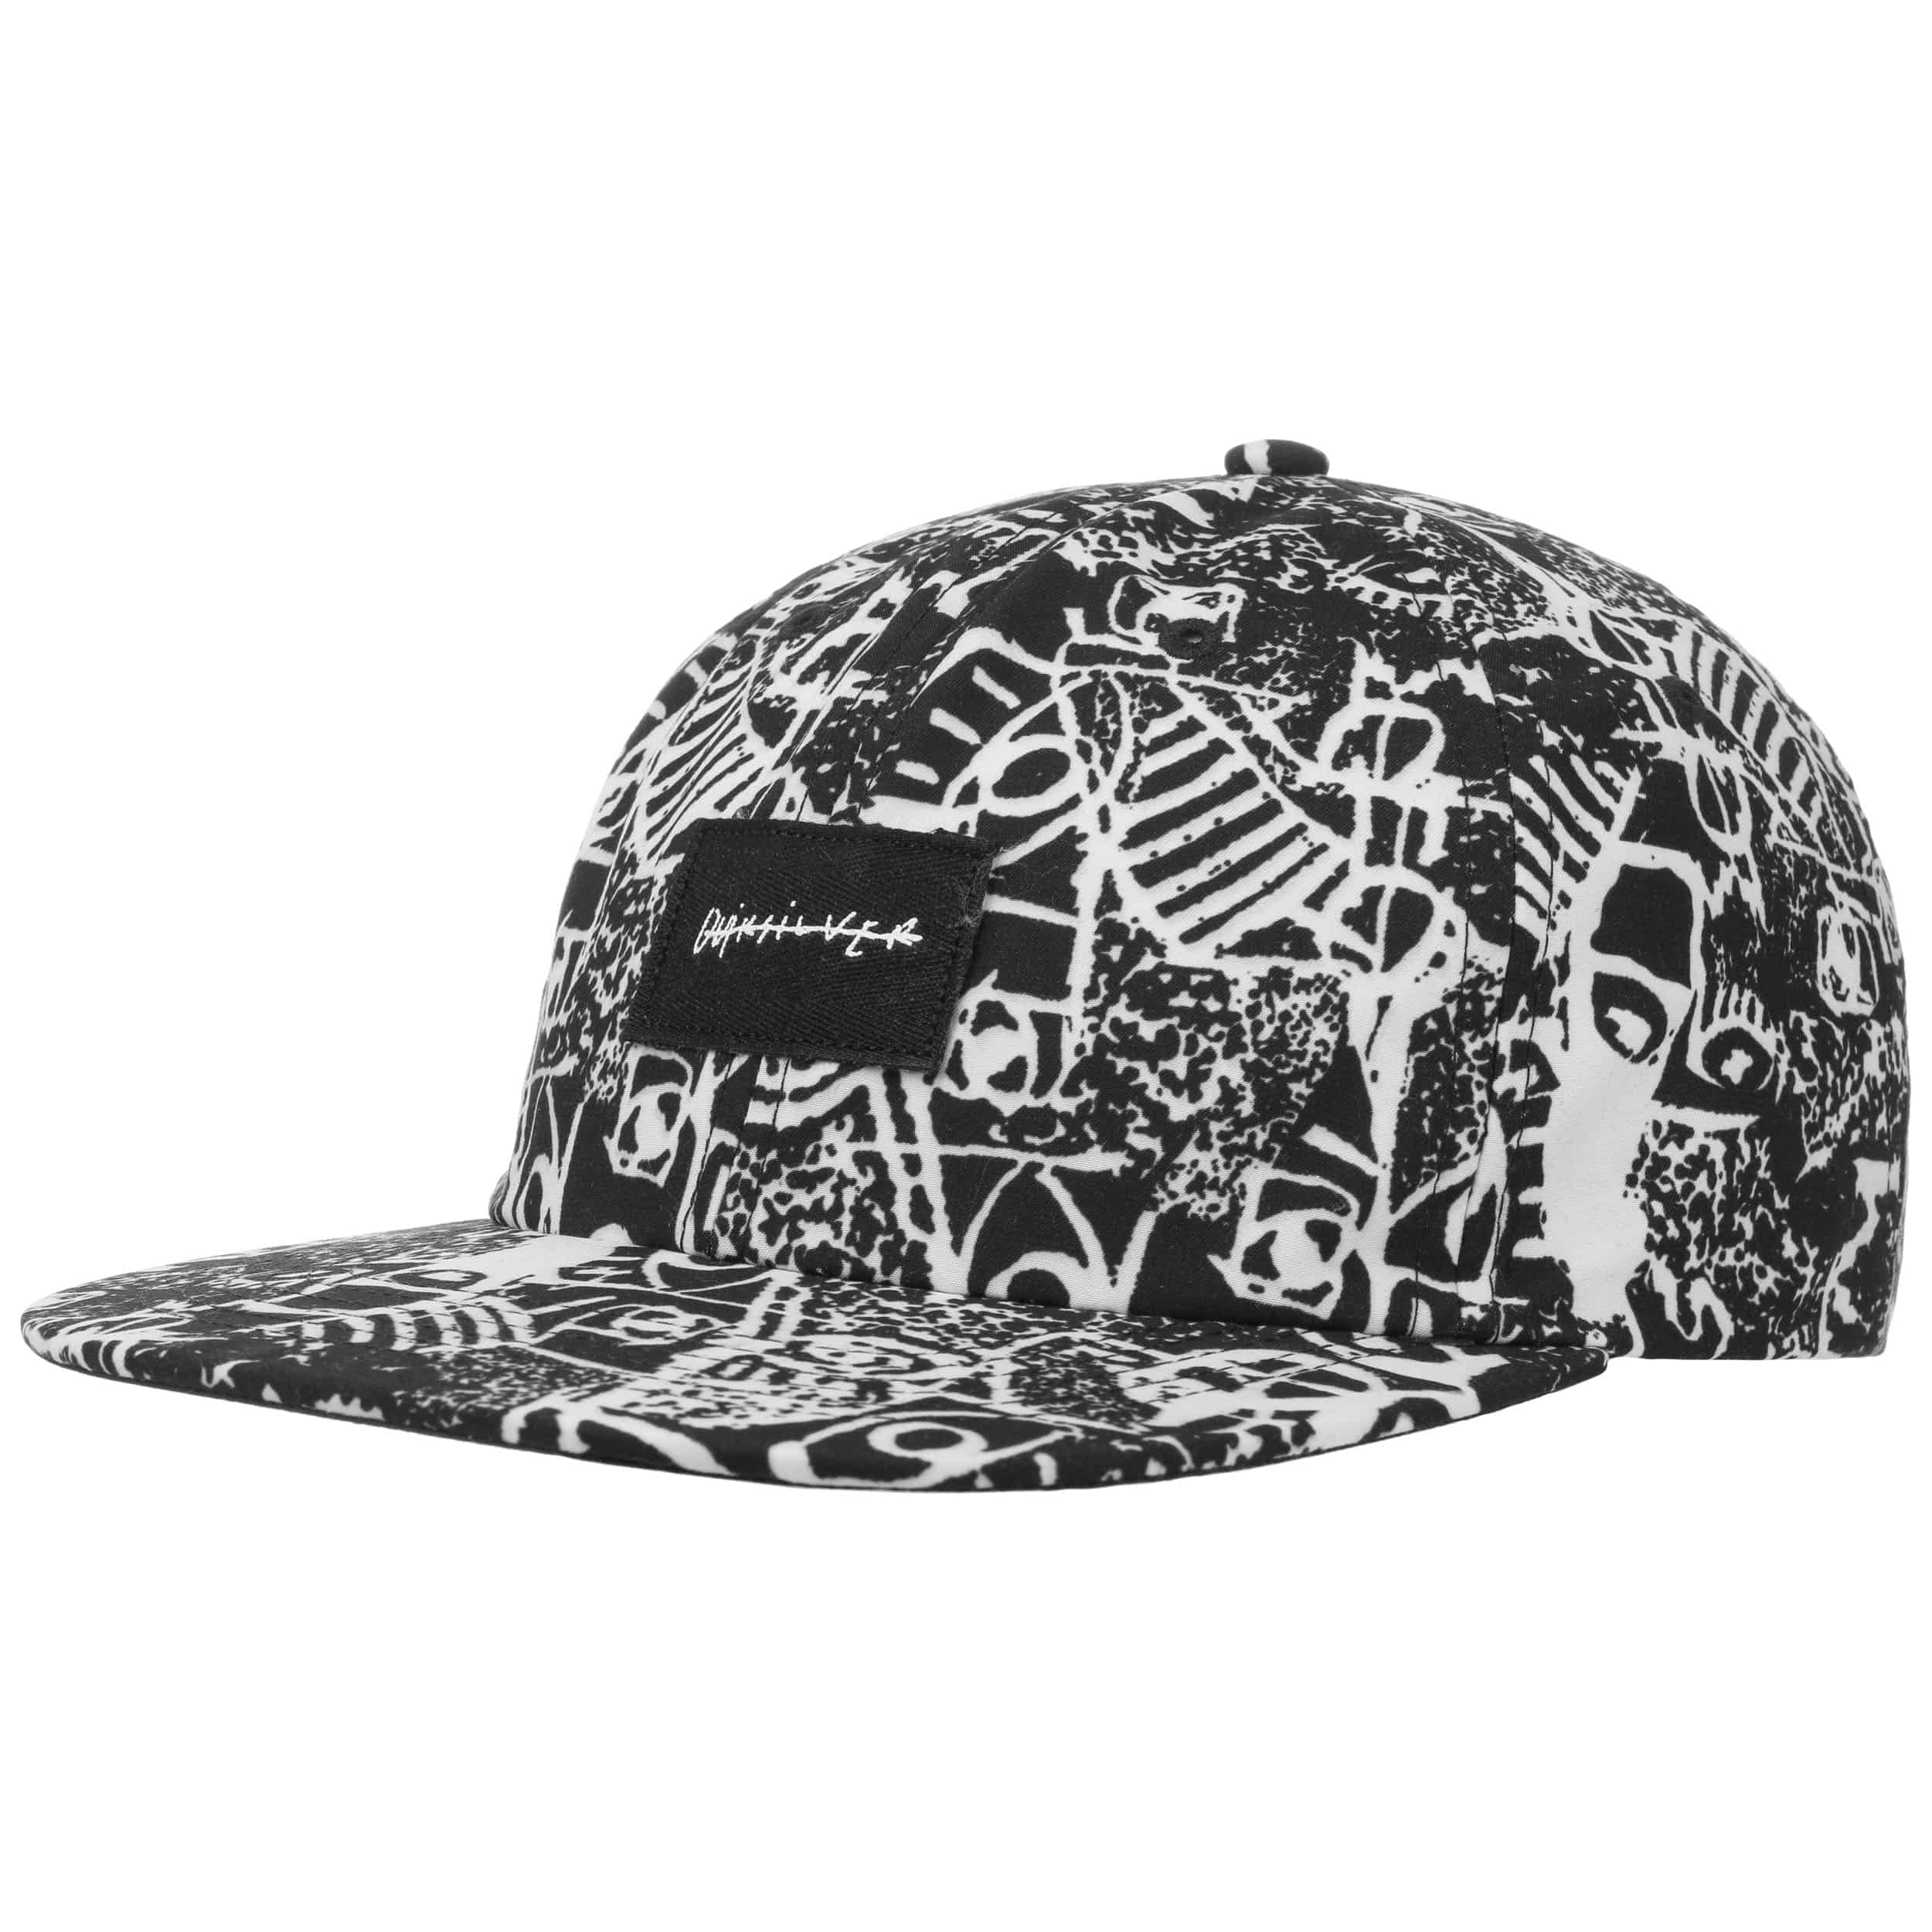 ee924483774a9 sale quiksilver peak trucker cap black 52fb8 dd1d3  closeout nighty  snapback cap by quiksilver black 4 ef751 8c1c6